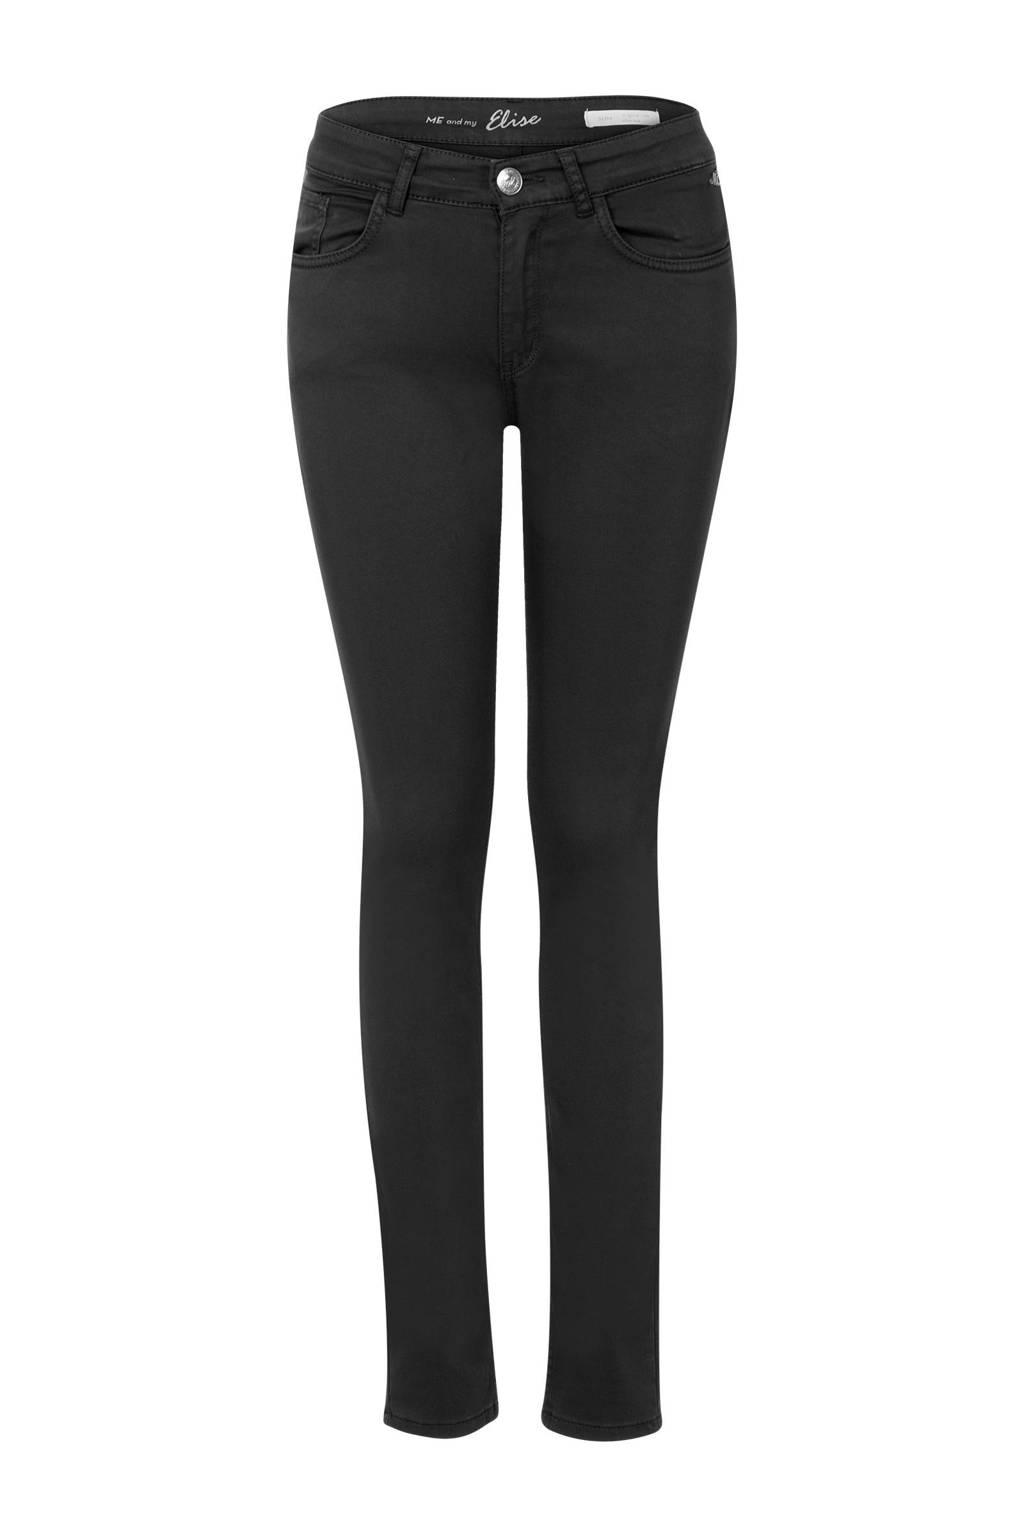 Miss Etam Lang slim fit jeans Elise 36 inch zwart, Zwart